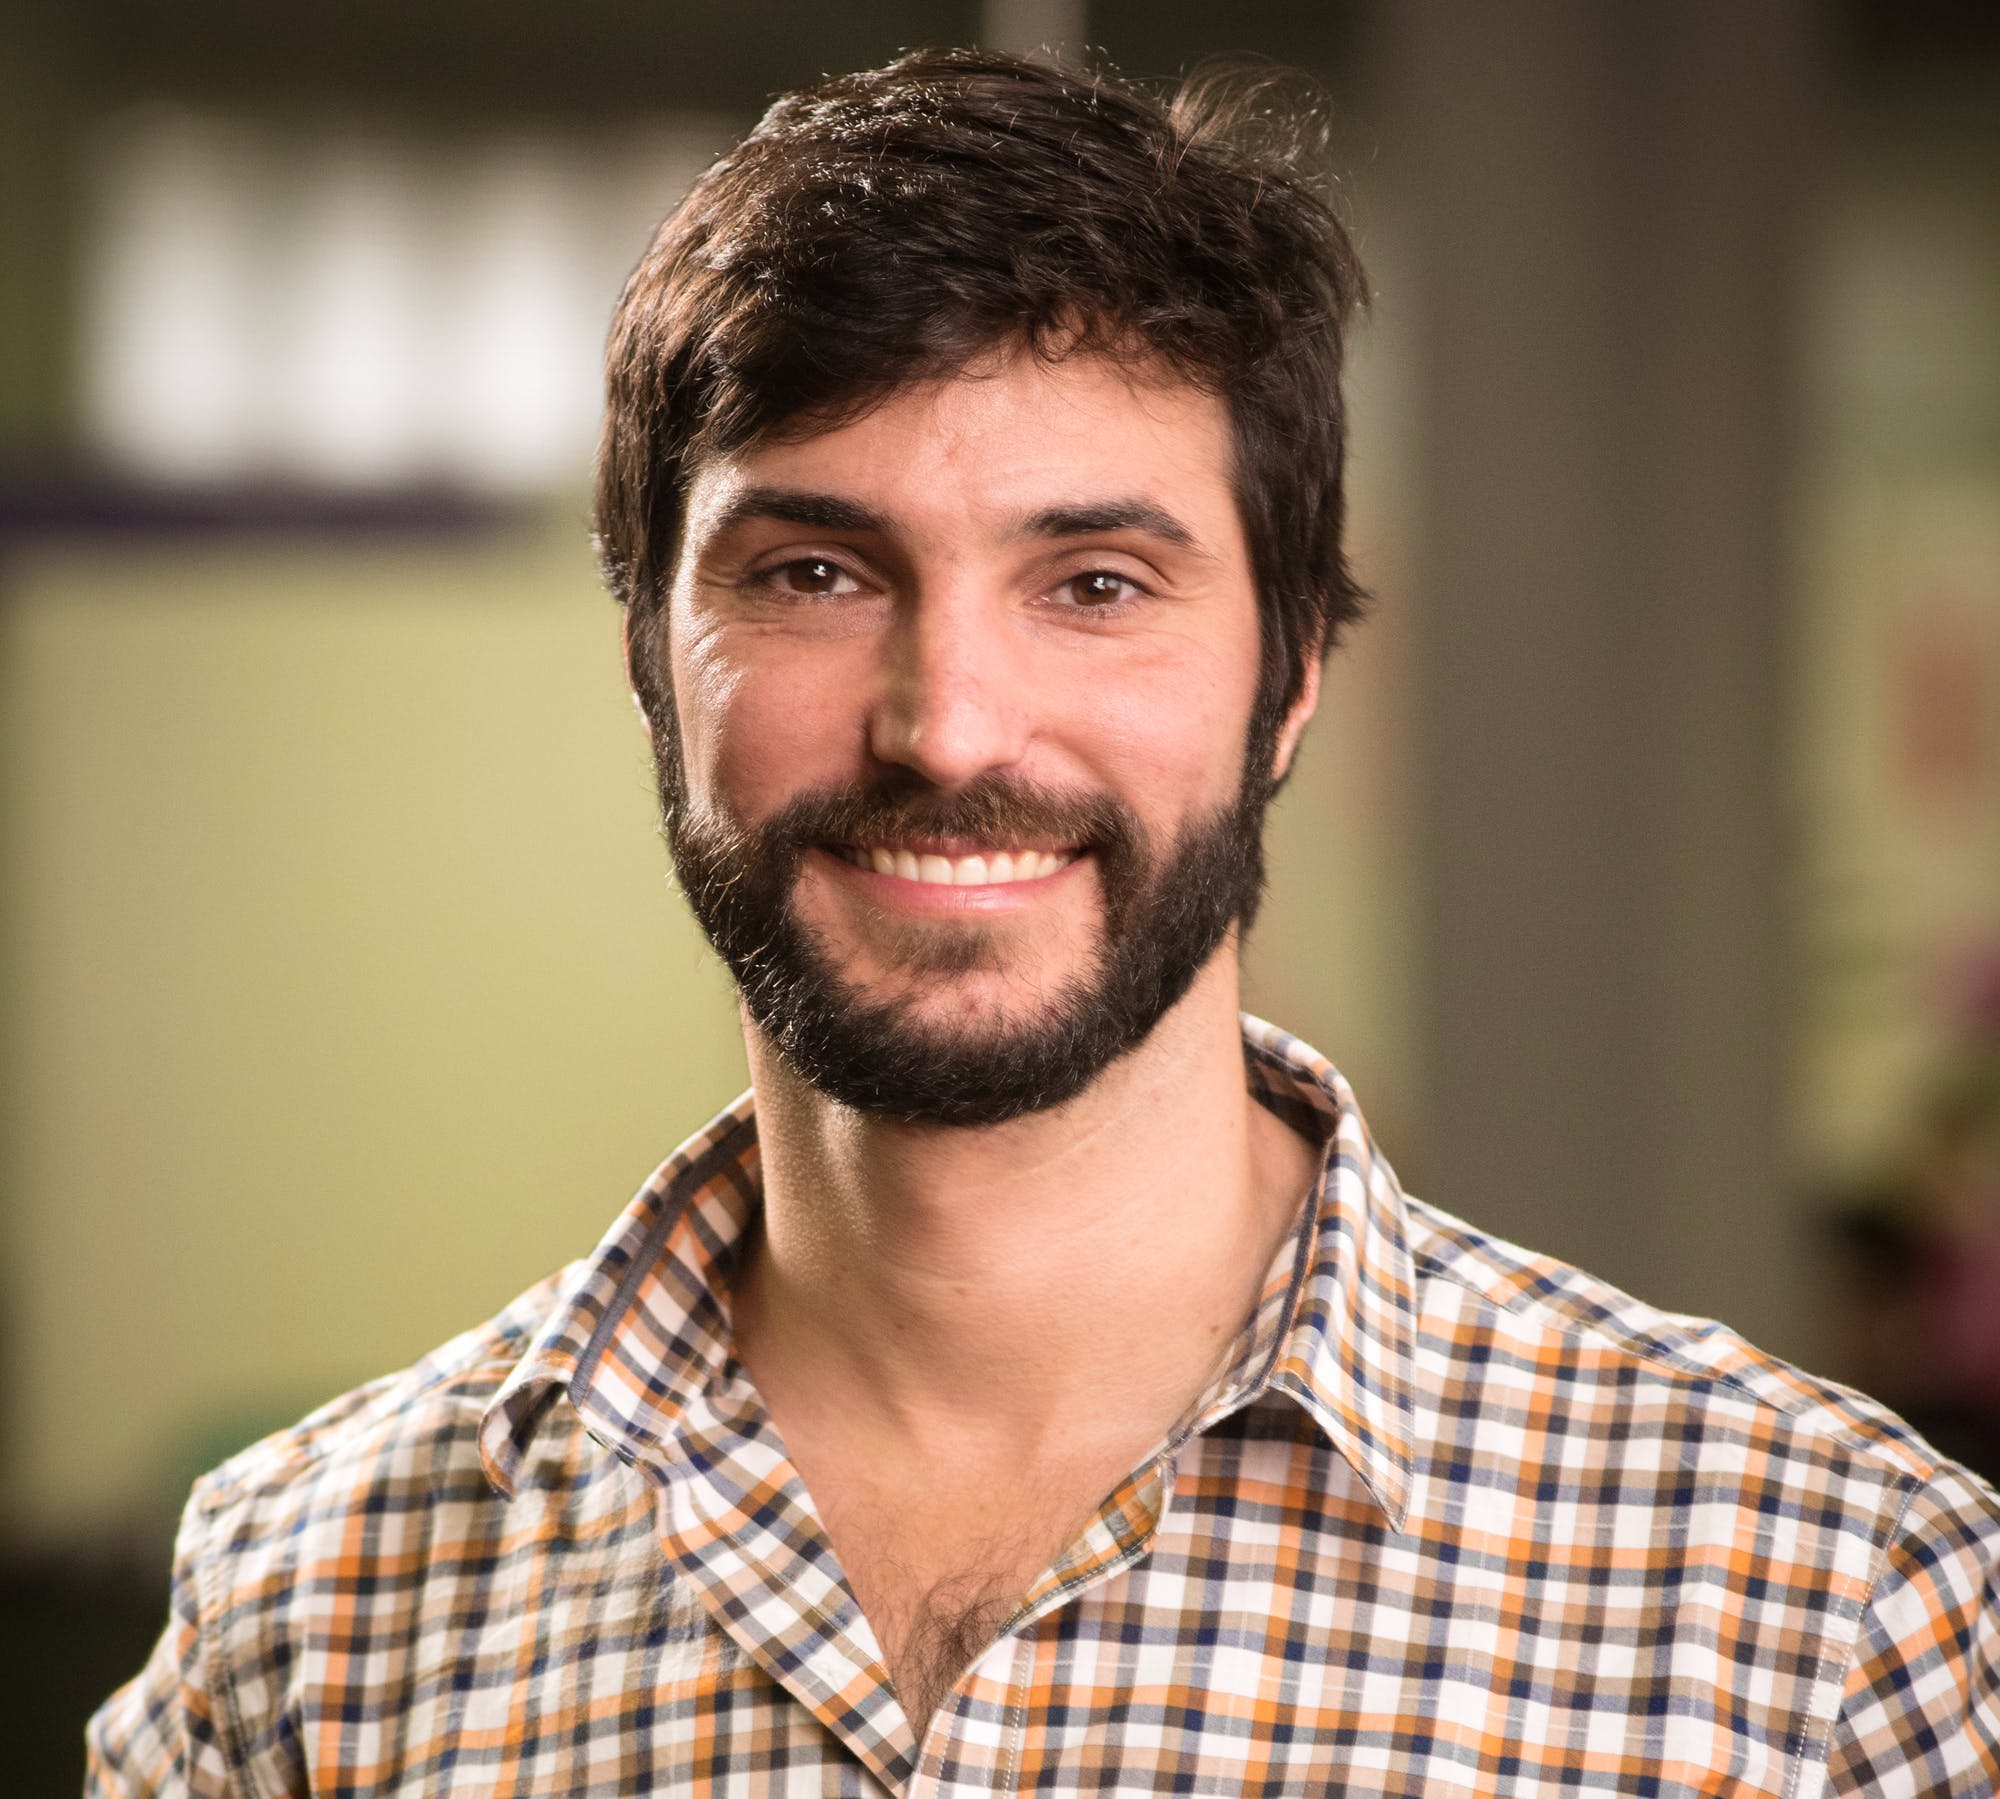 Meet Our Brazil Labs Team: Bruno Scolari